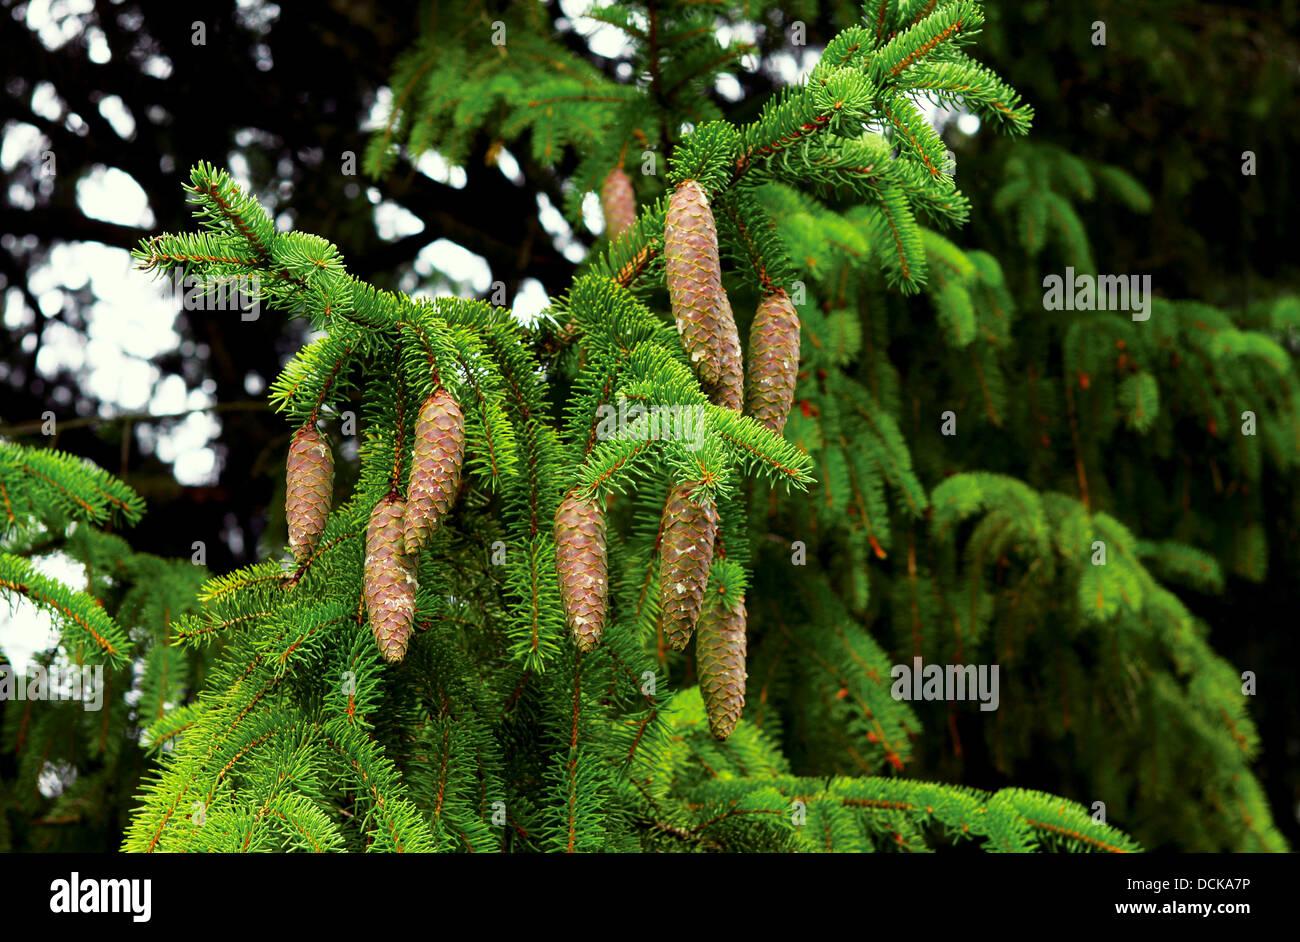 spruce branch - Stock Image